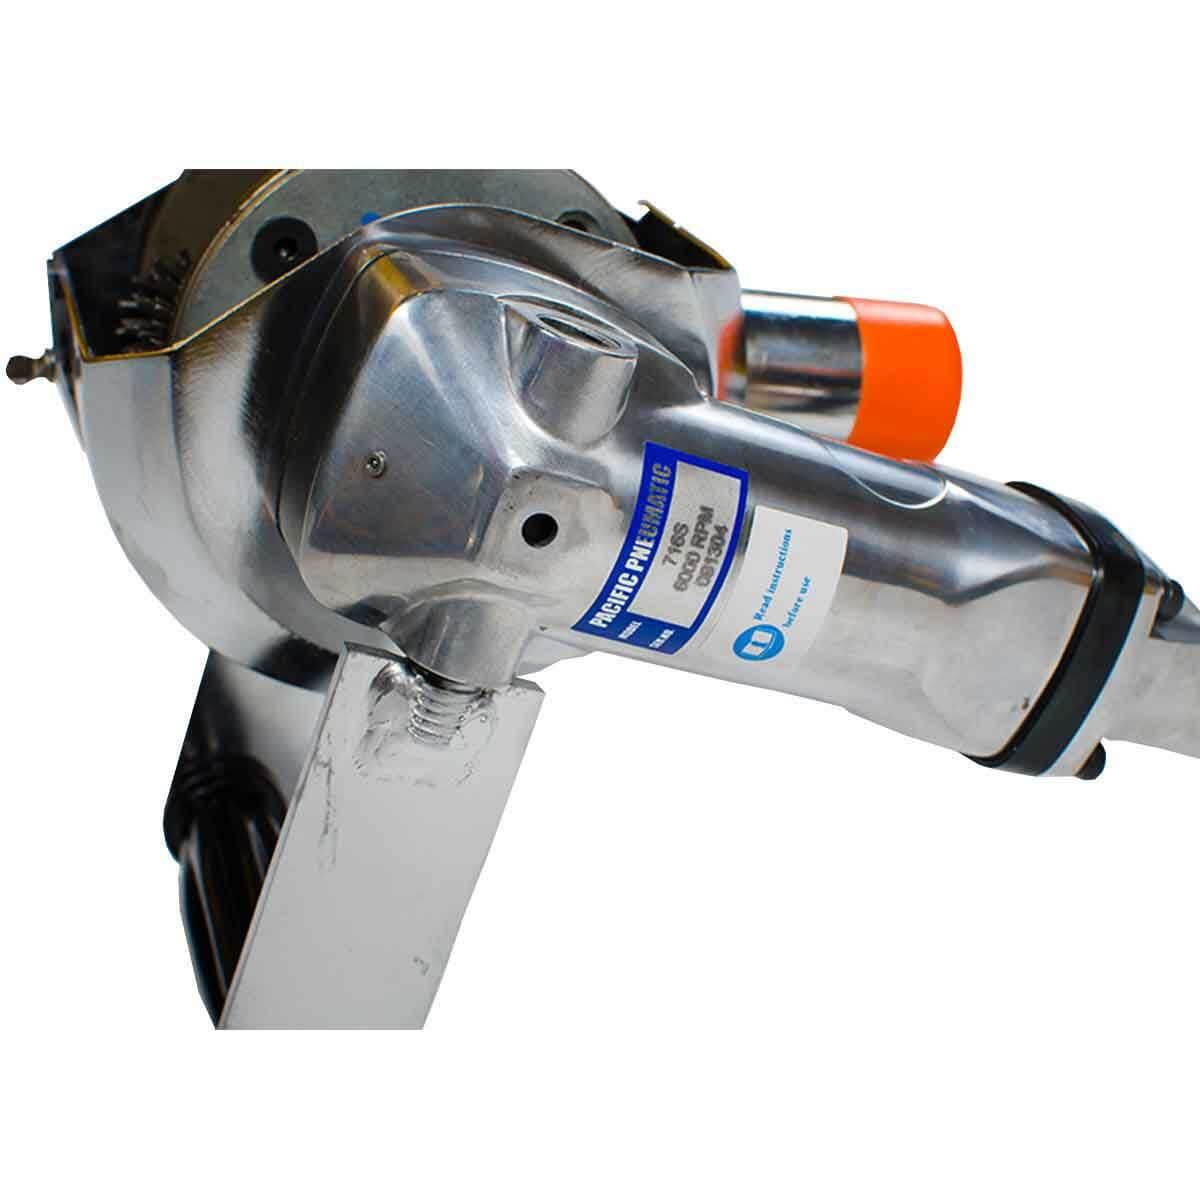 Bartell Air Scarifier handle